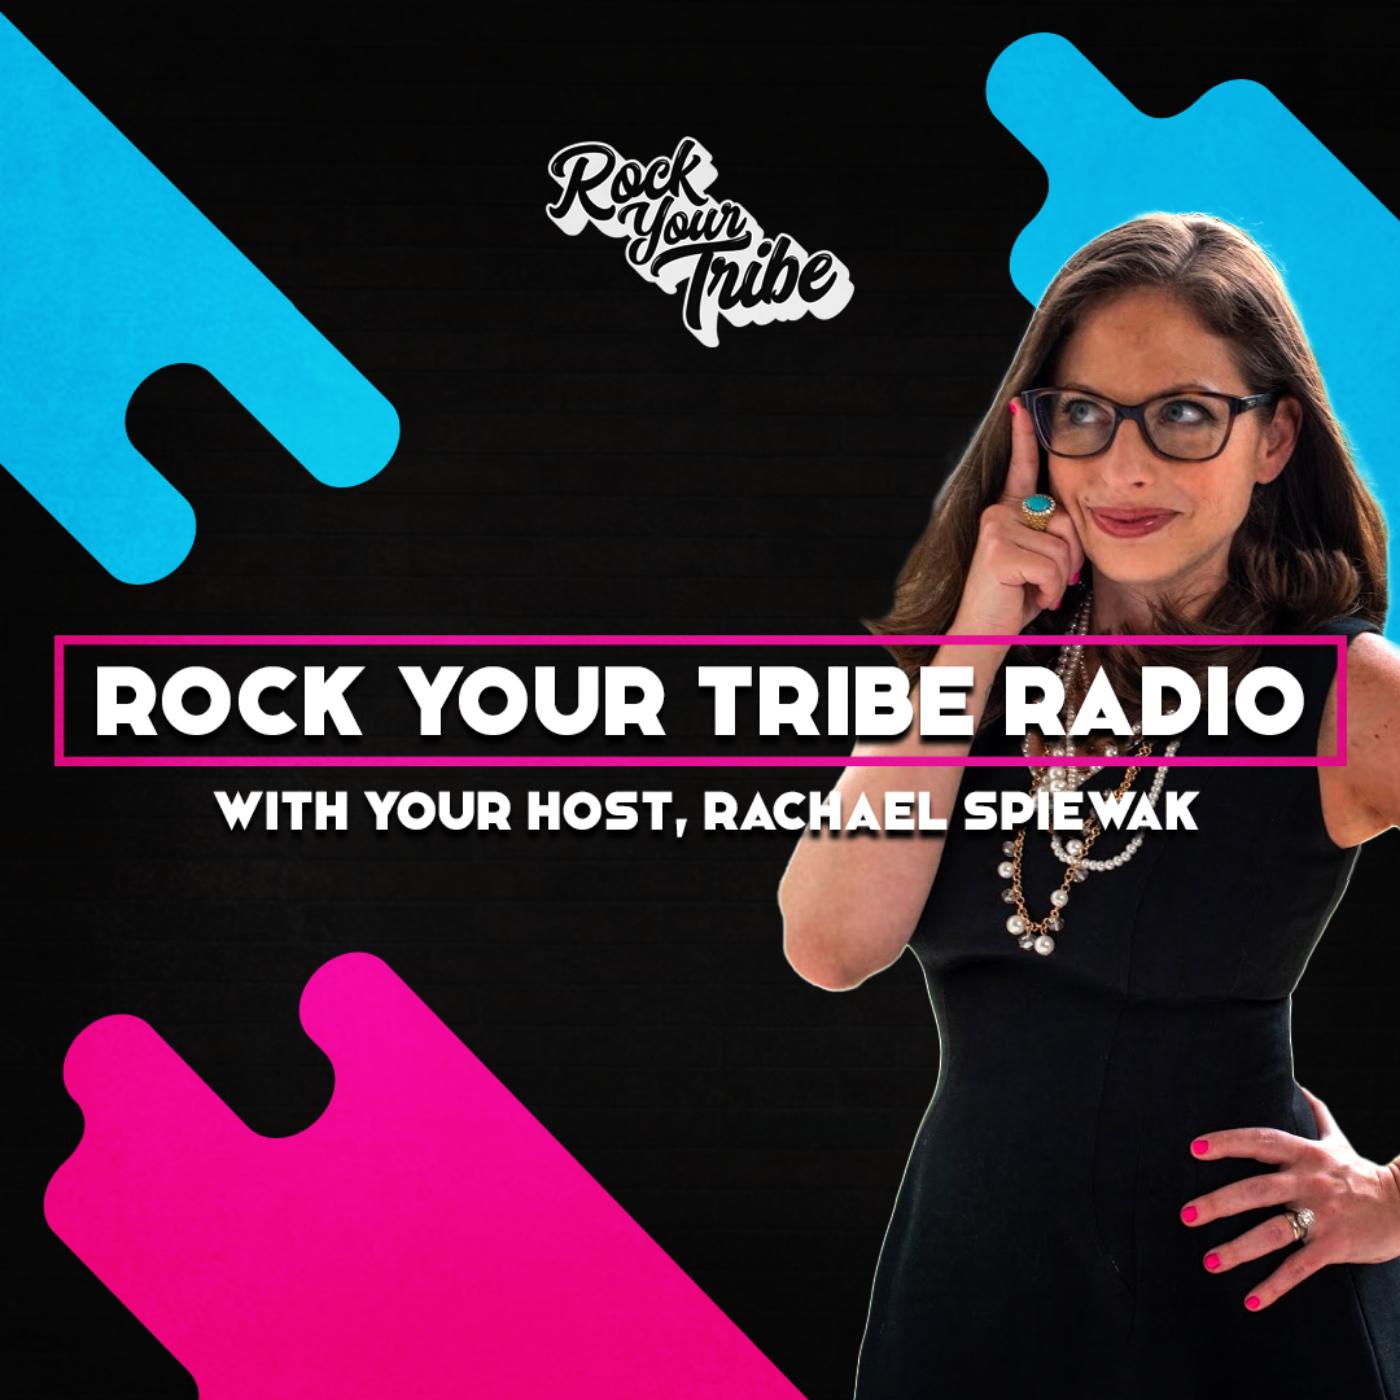 Rock Your Tribe Radio